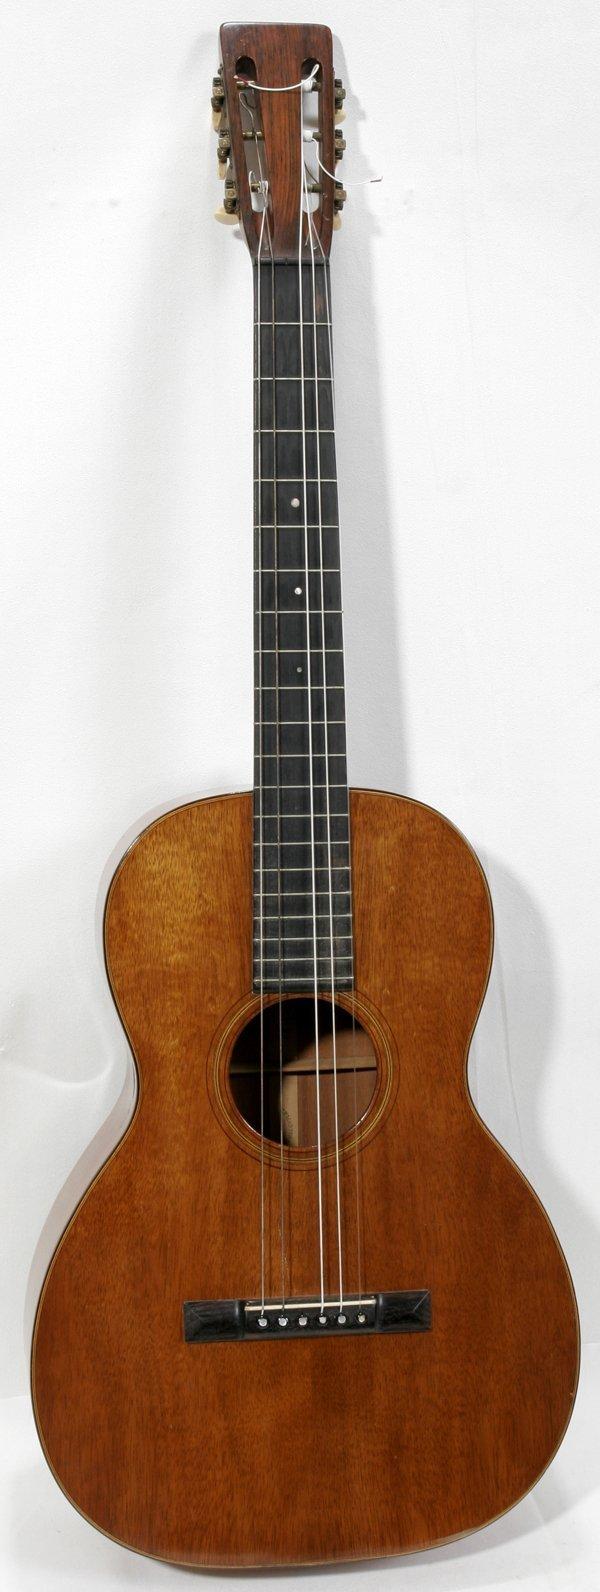 120009: MARTIN 0-1815KOA, ACOUSTIC WOOD GUITAR, 1923